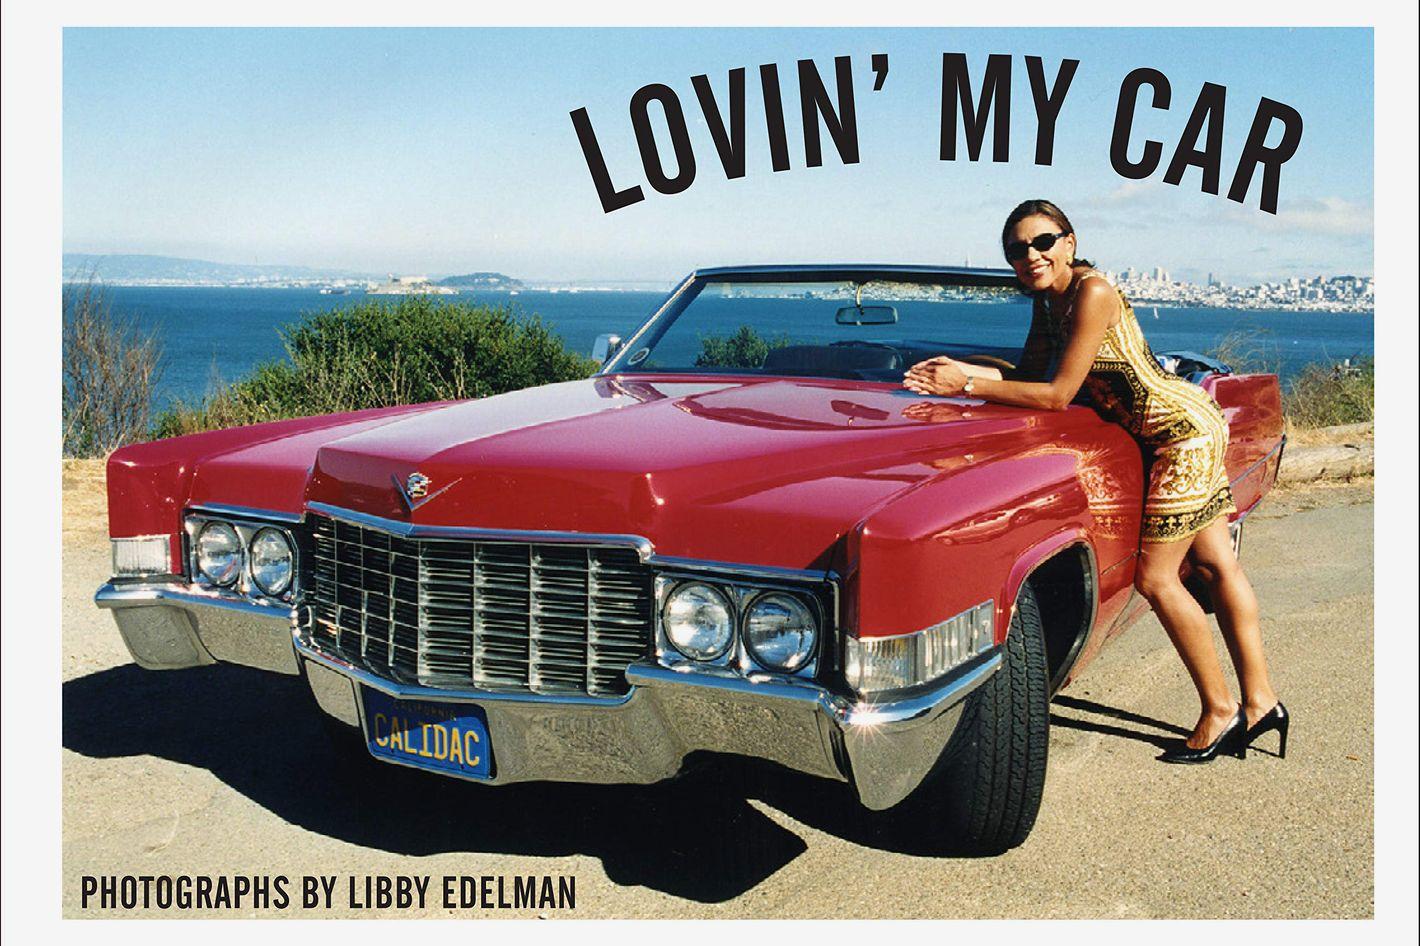 Lovin' My Car: Women in the Driver's Seat